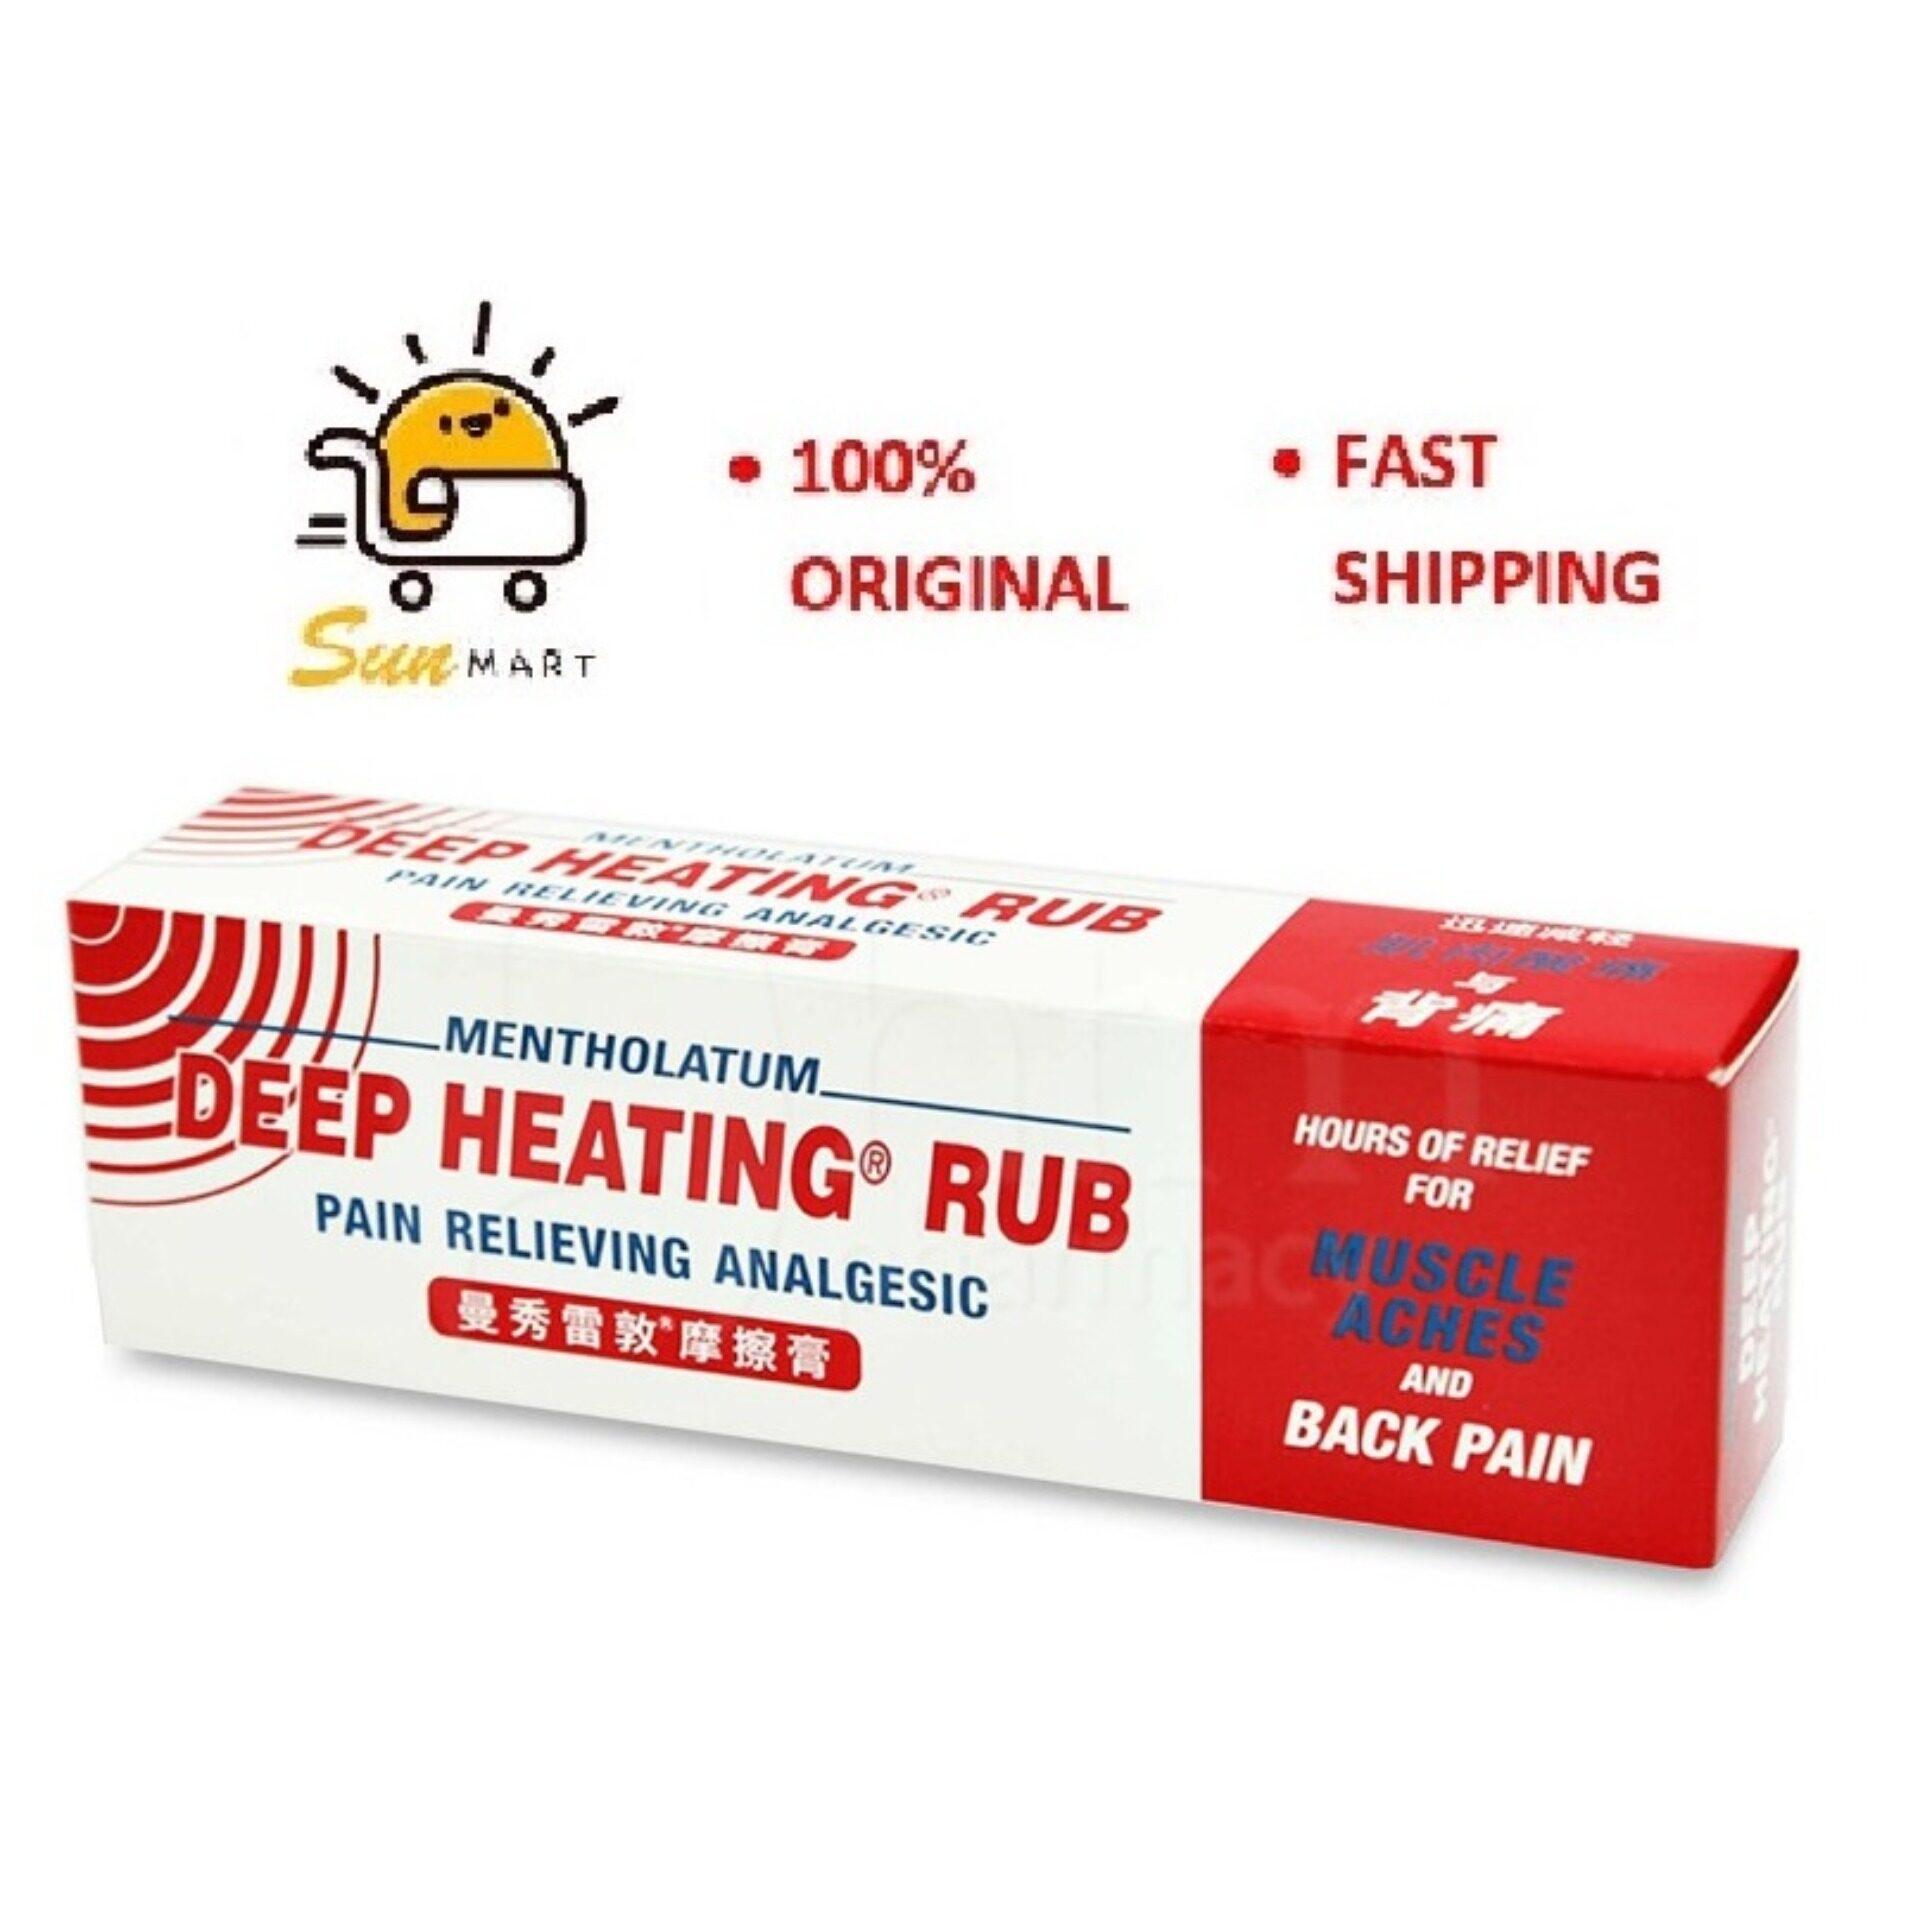 Mentholatum Deep Heating Rub (35G)